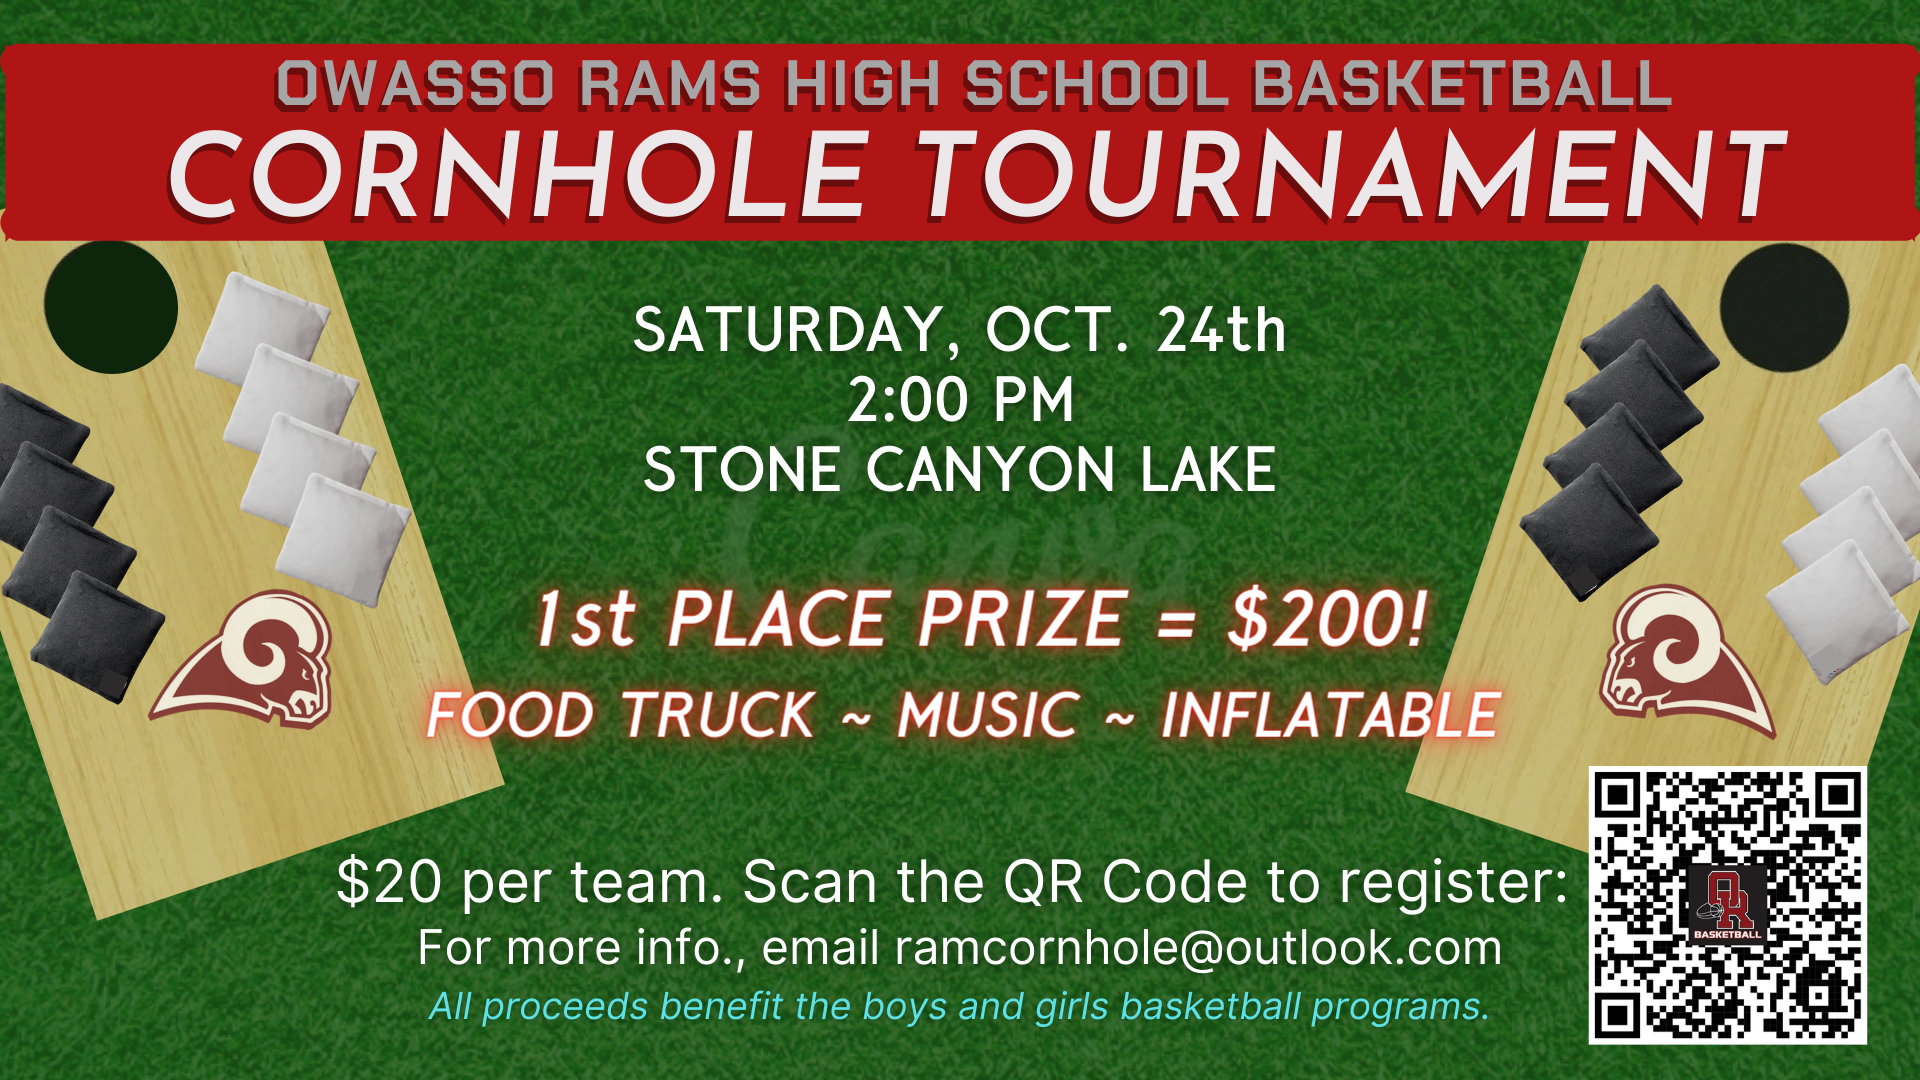 Basketball Cornhole Fundraiser